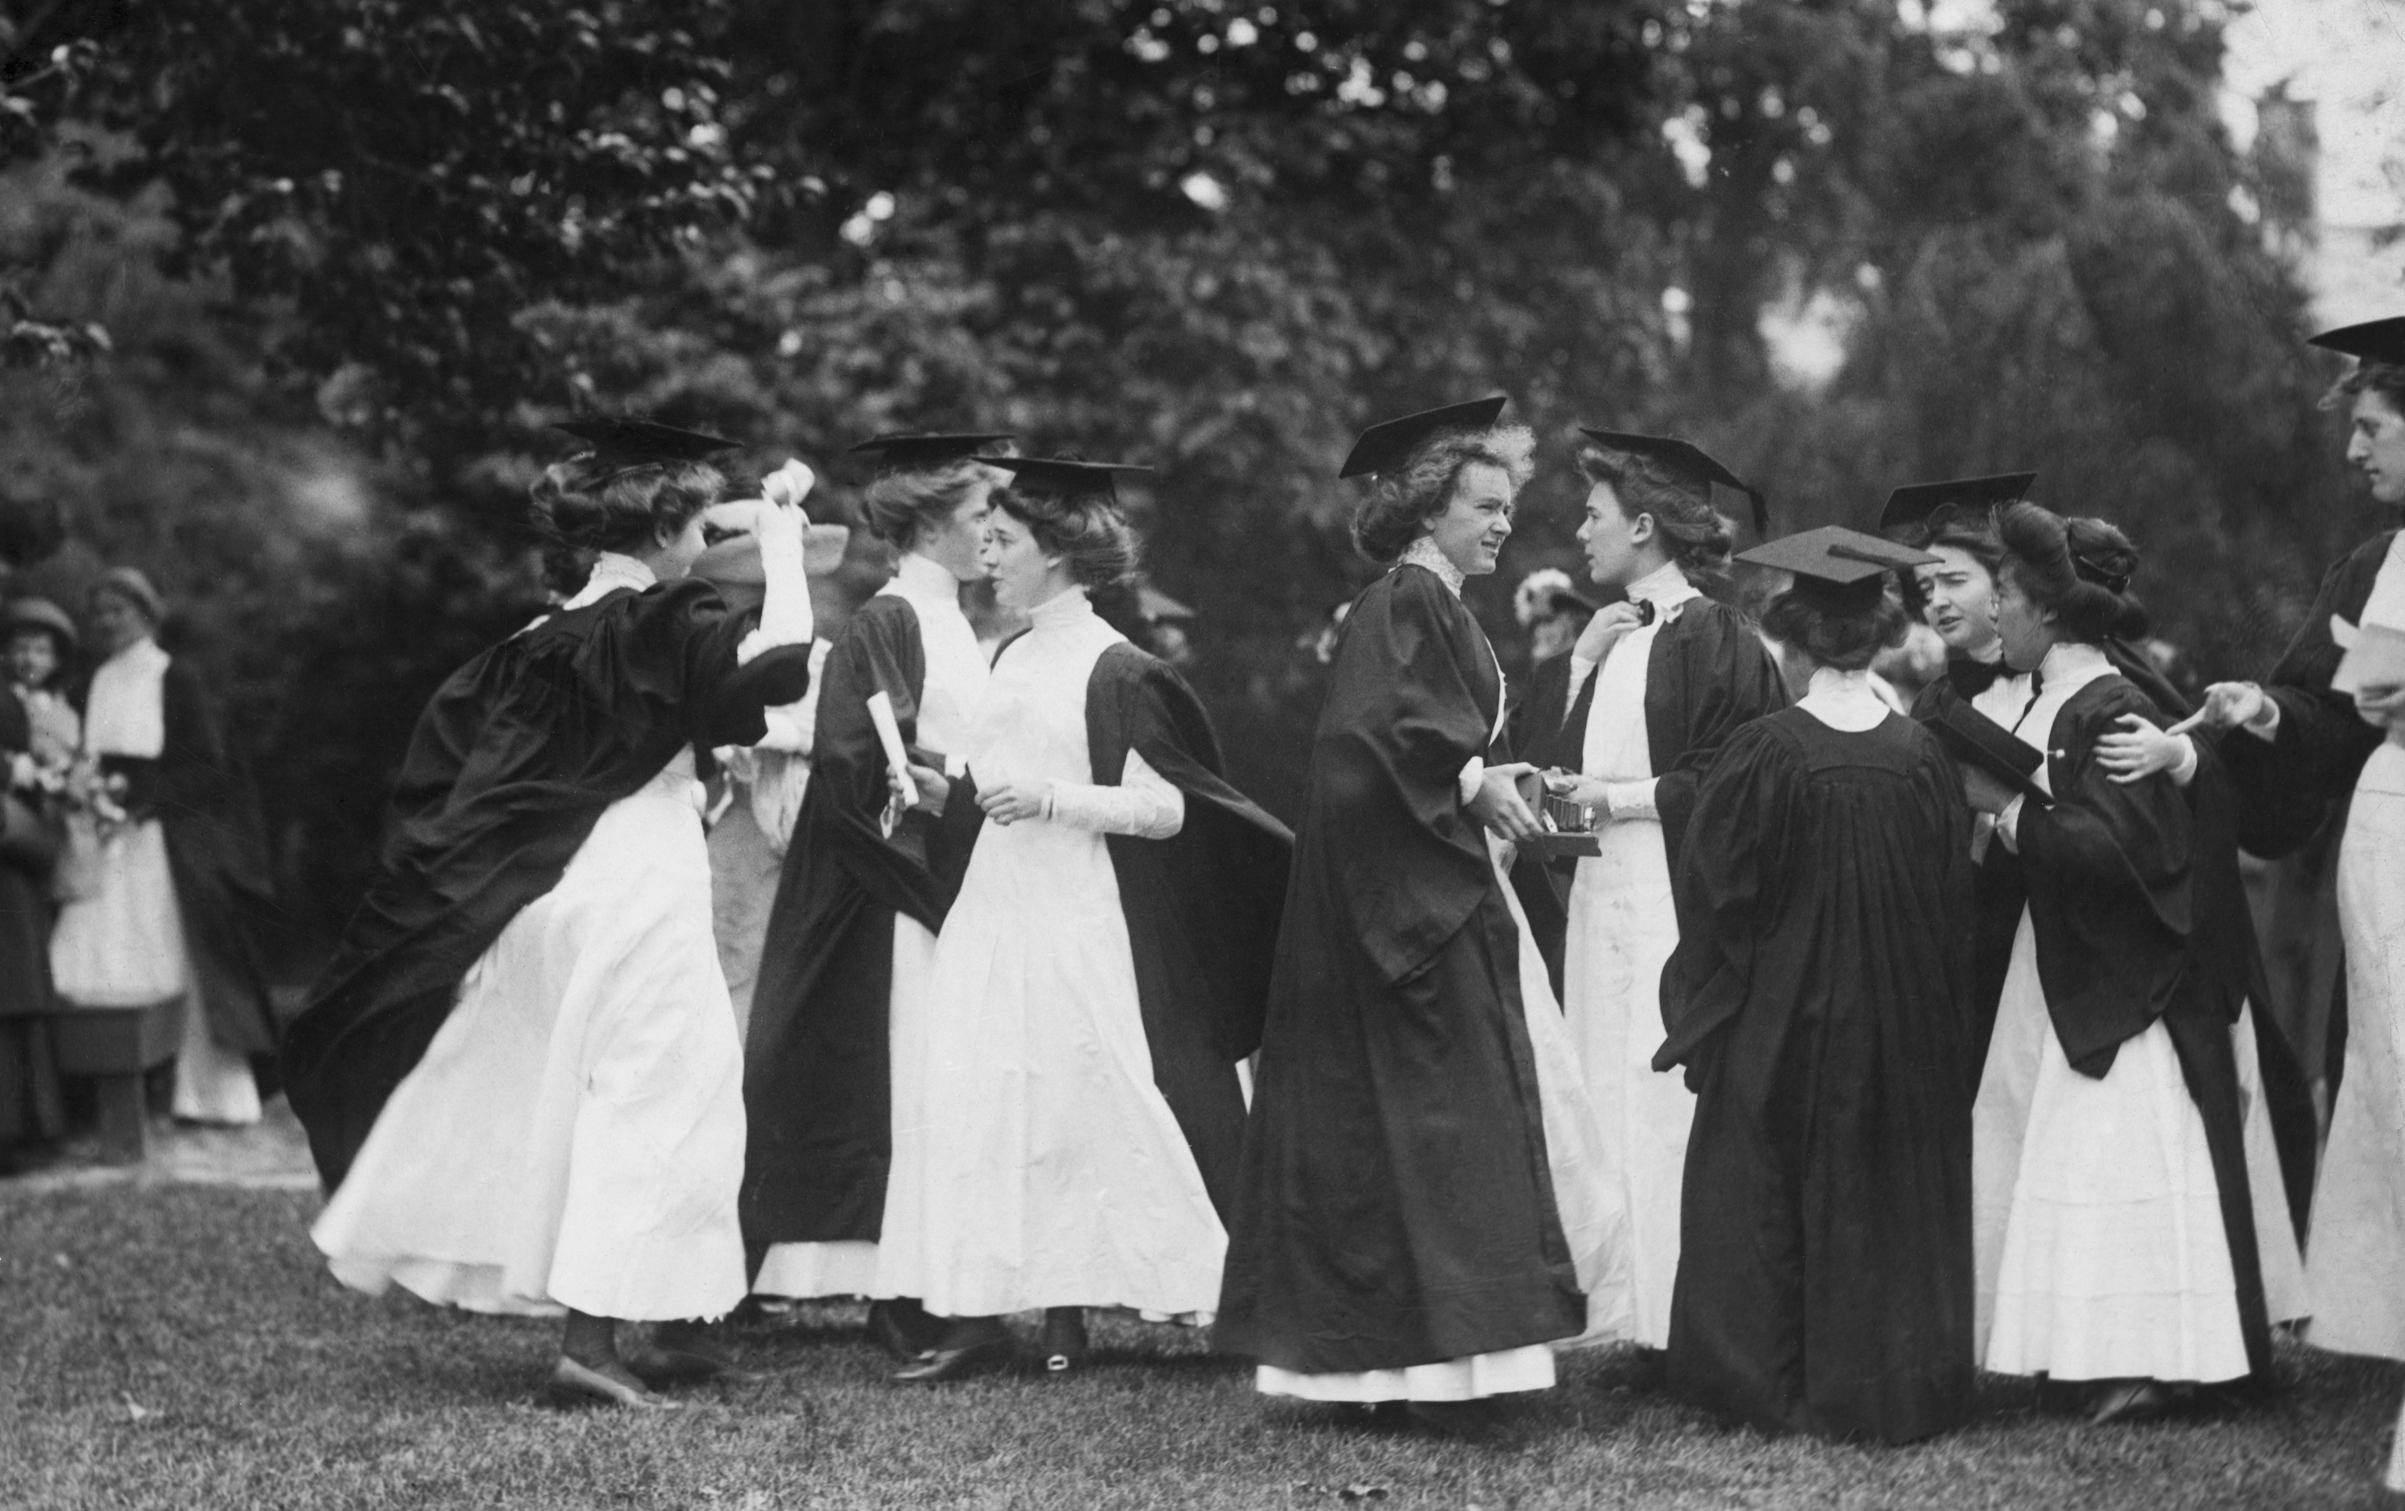 Women graduates exiting after a graduation ceremony. Photograph, ca. 1900.